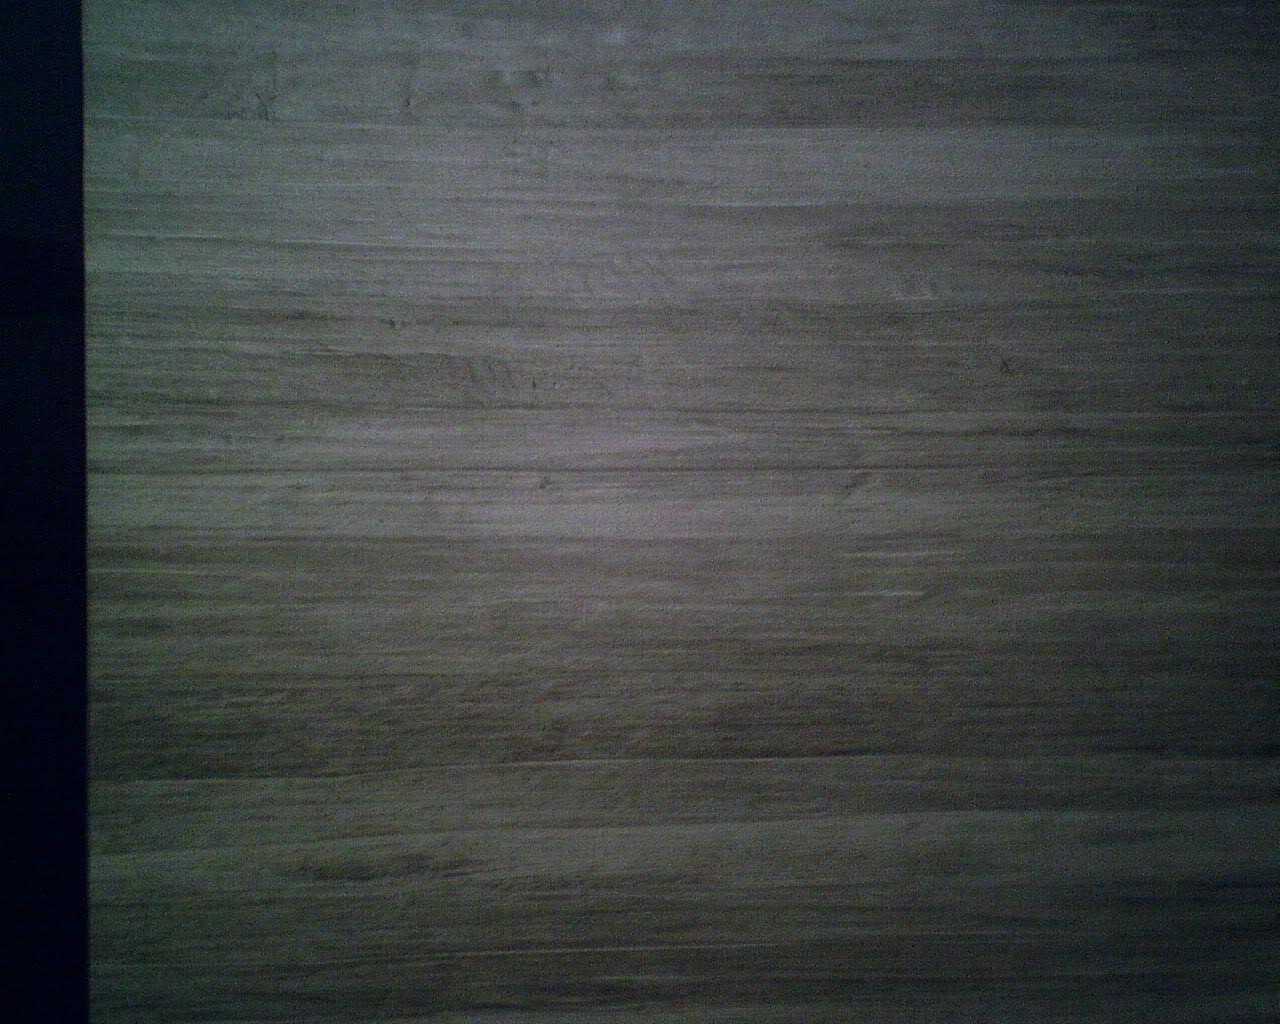 Smoky misty wood look textured vinyl wallcovering for Textured vinyl wallpaper bathroom